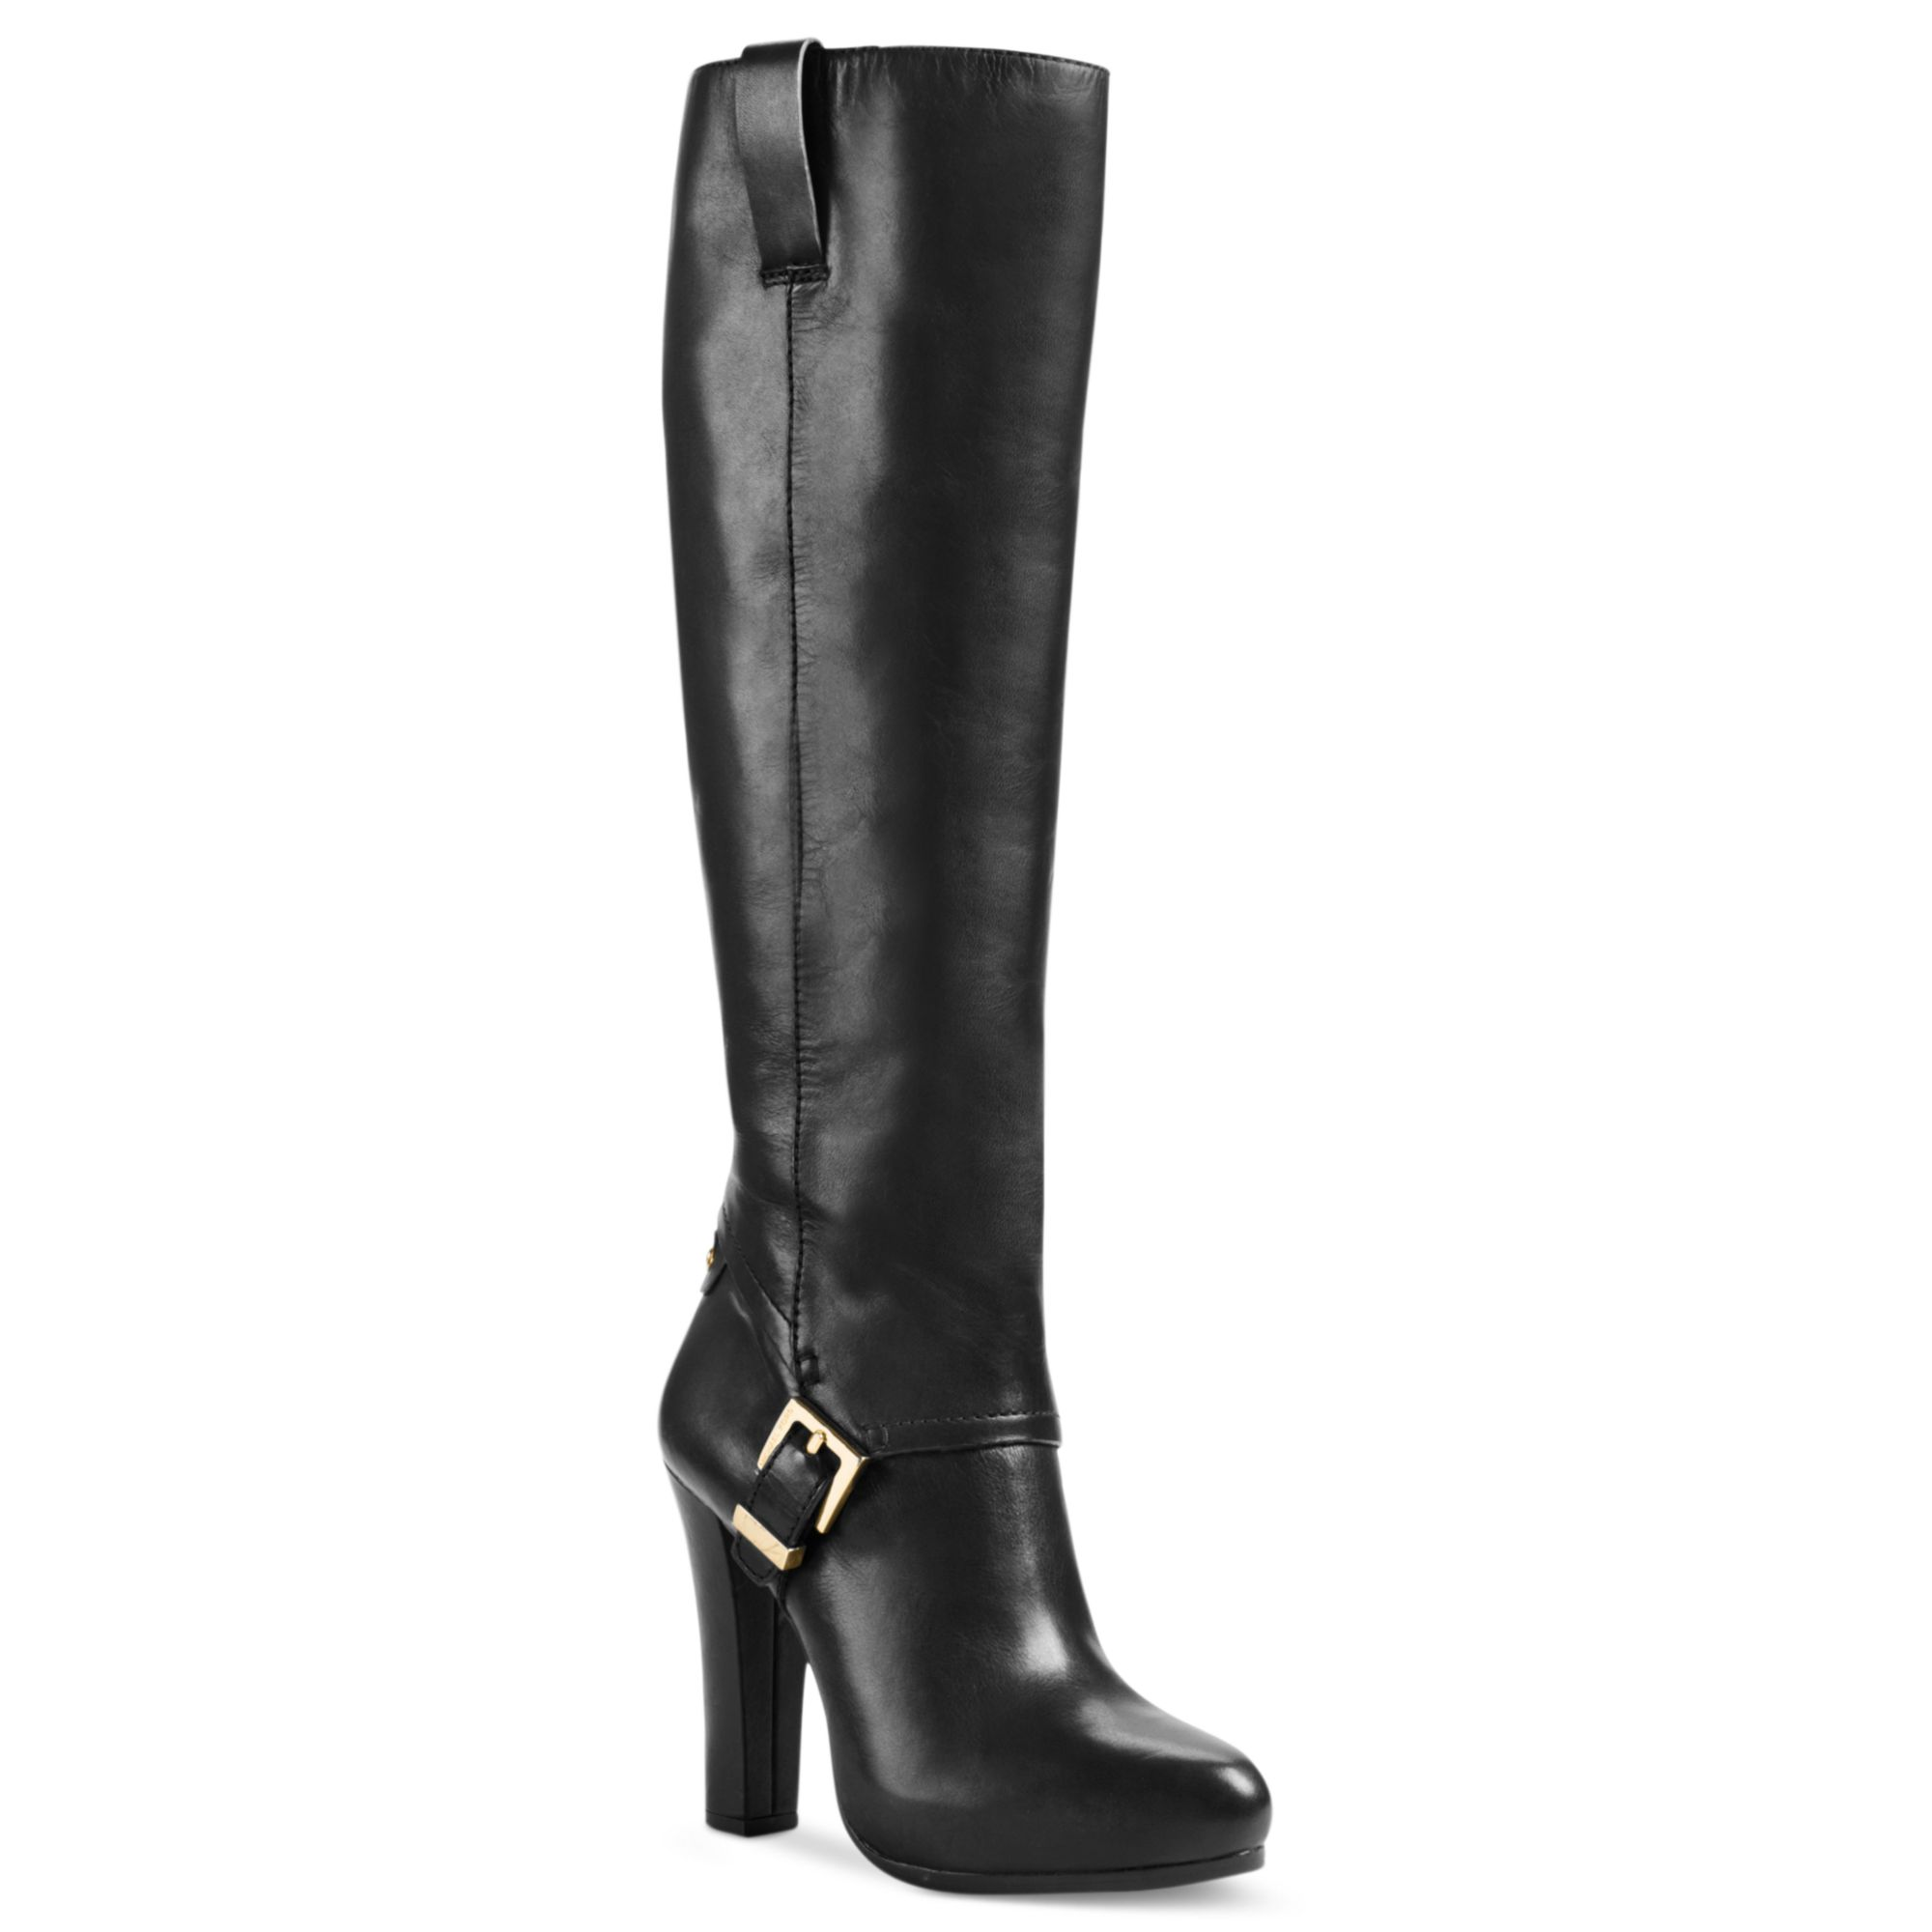 michael kors tamara high heel dress boots in black black